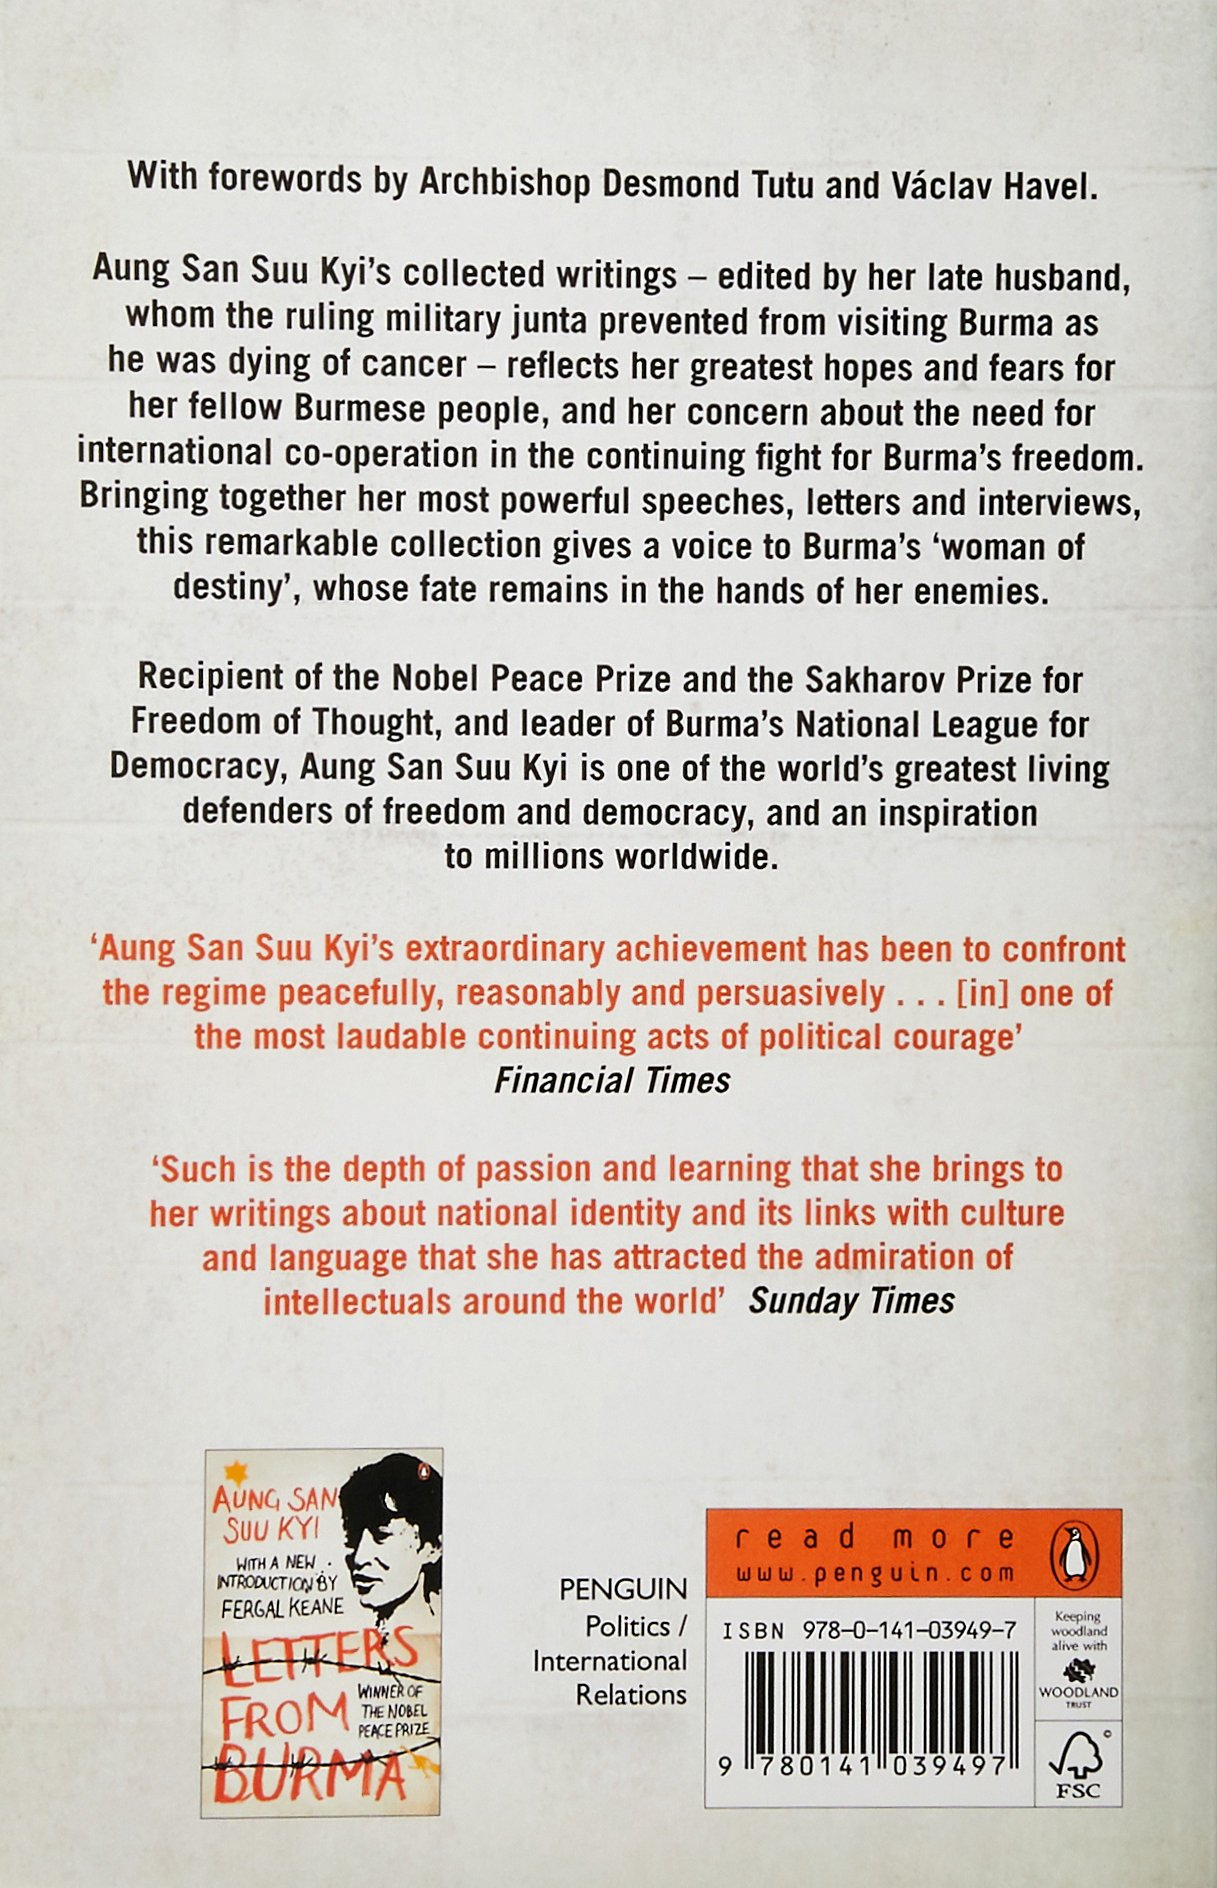 aung san suu kyi biography